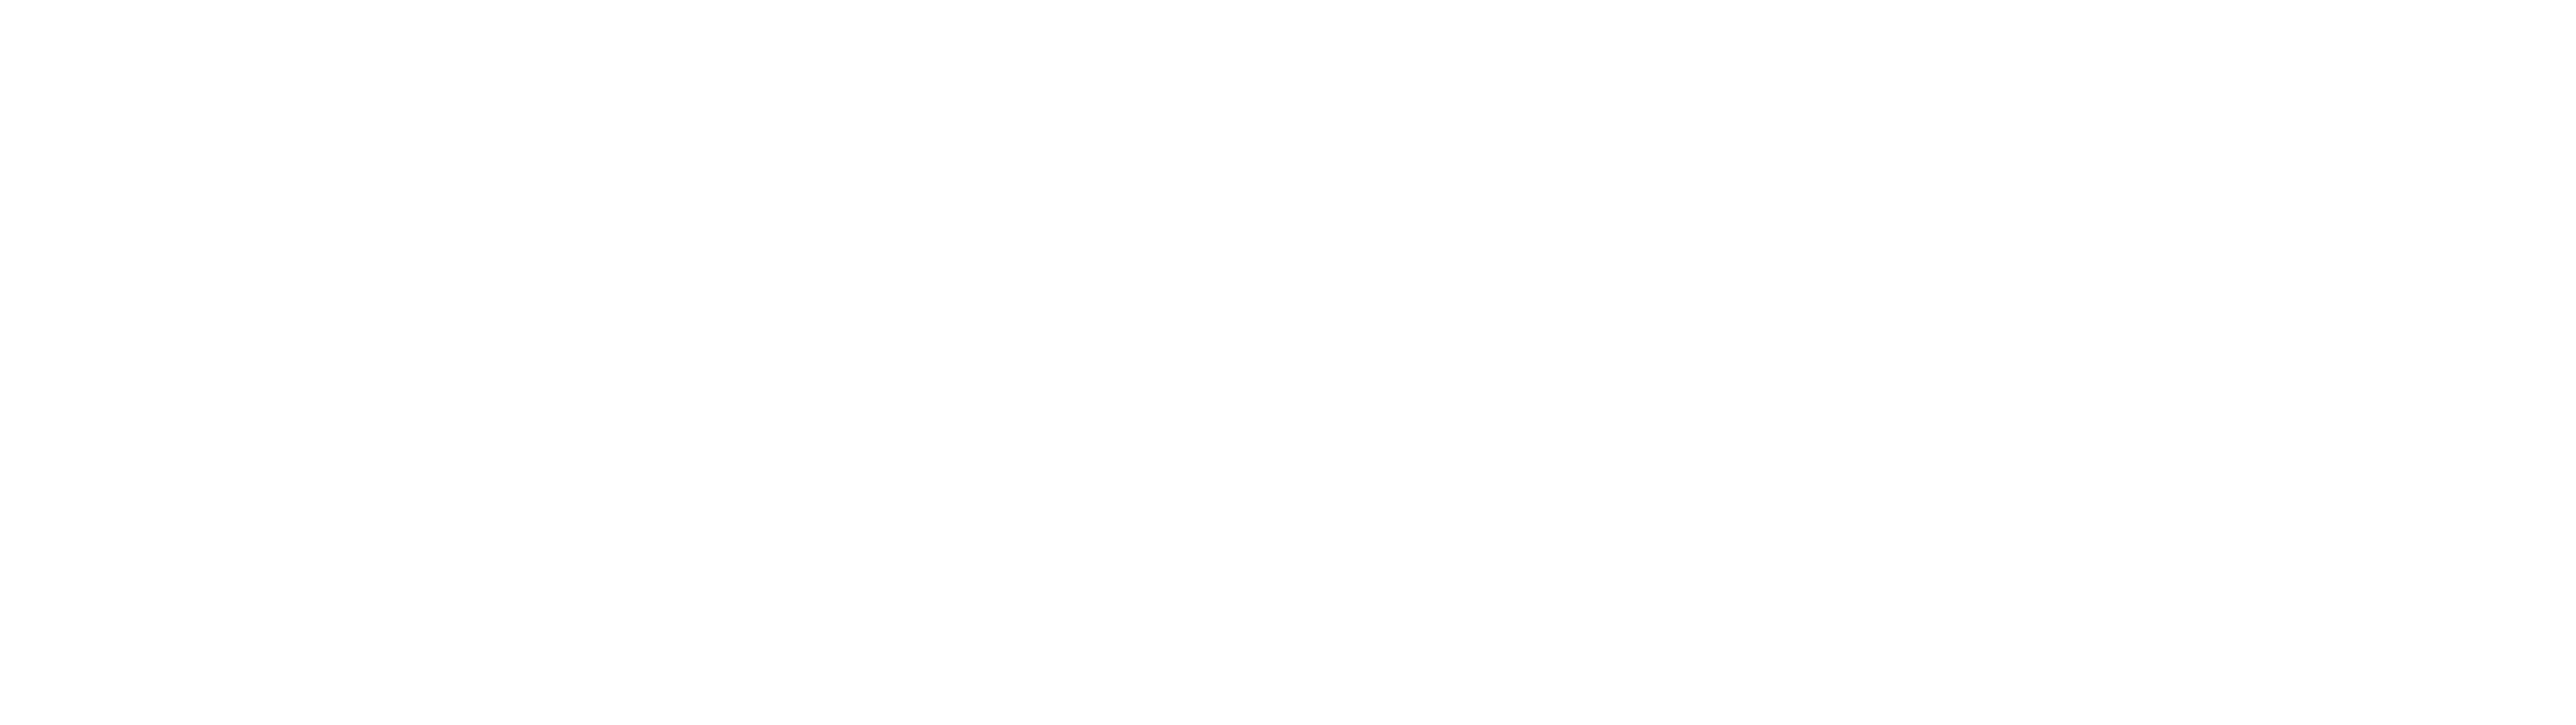 Ікона